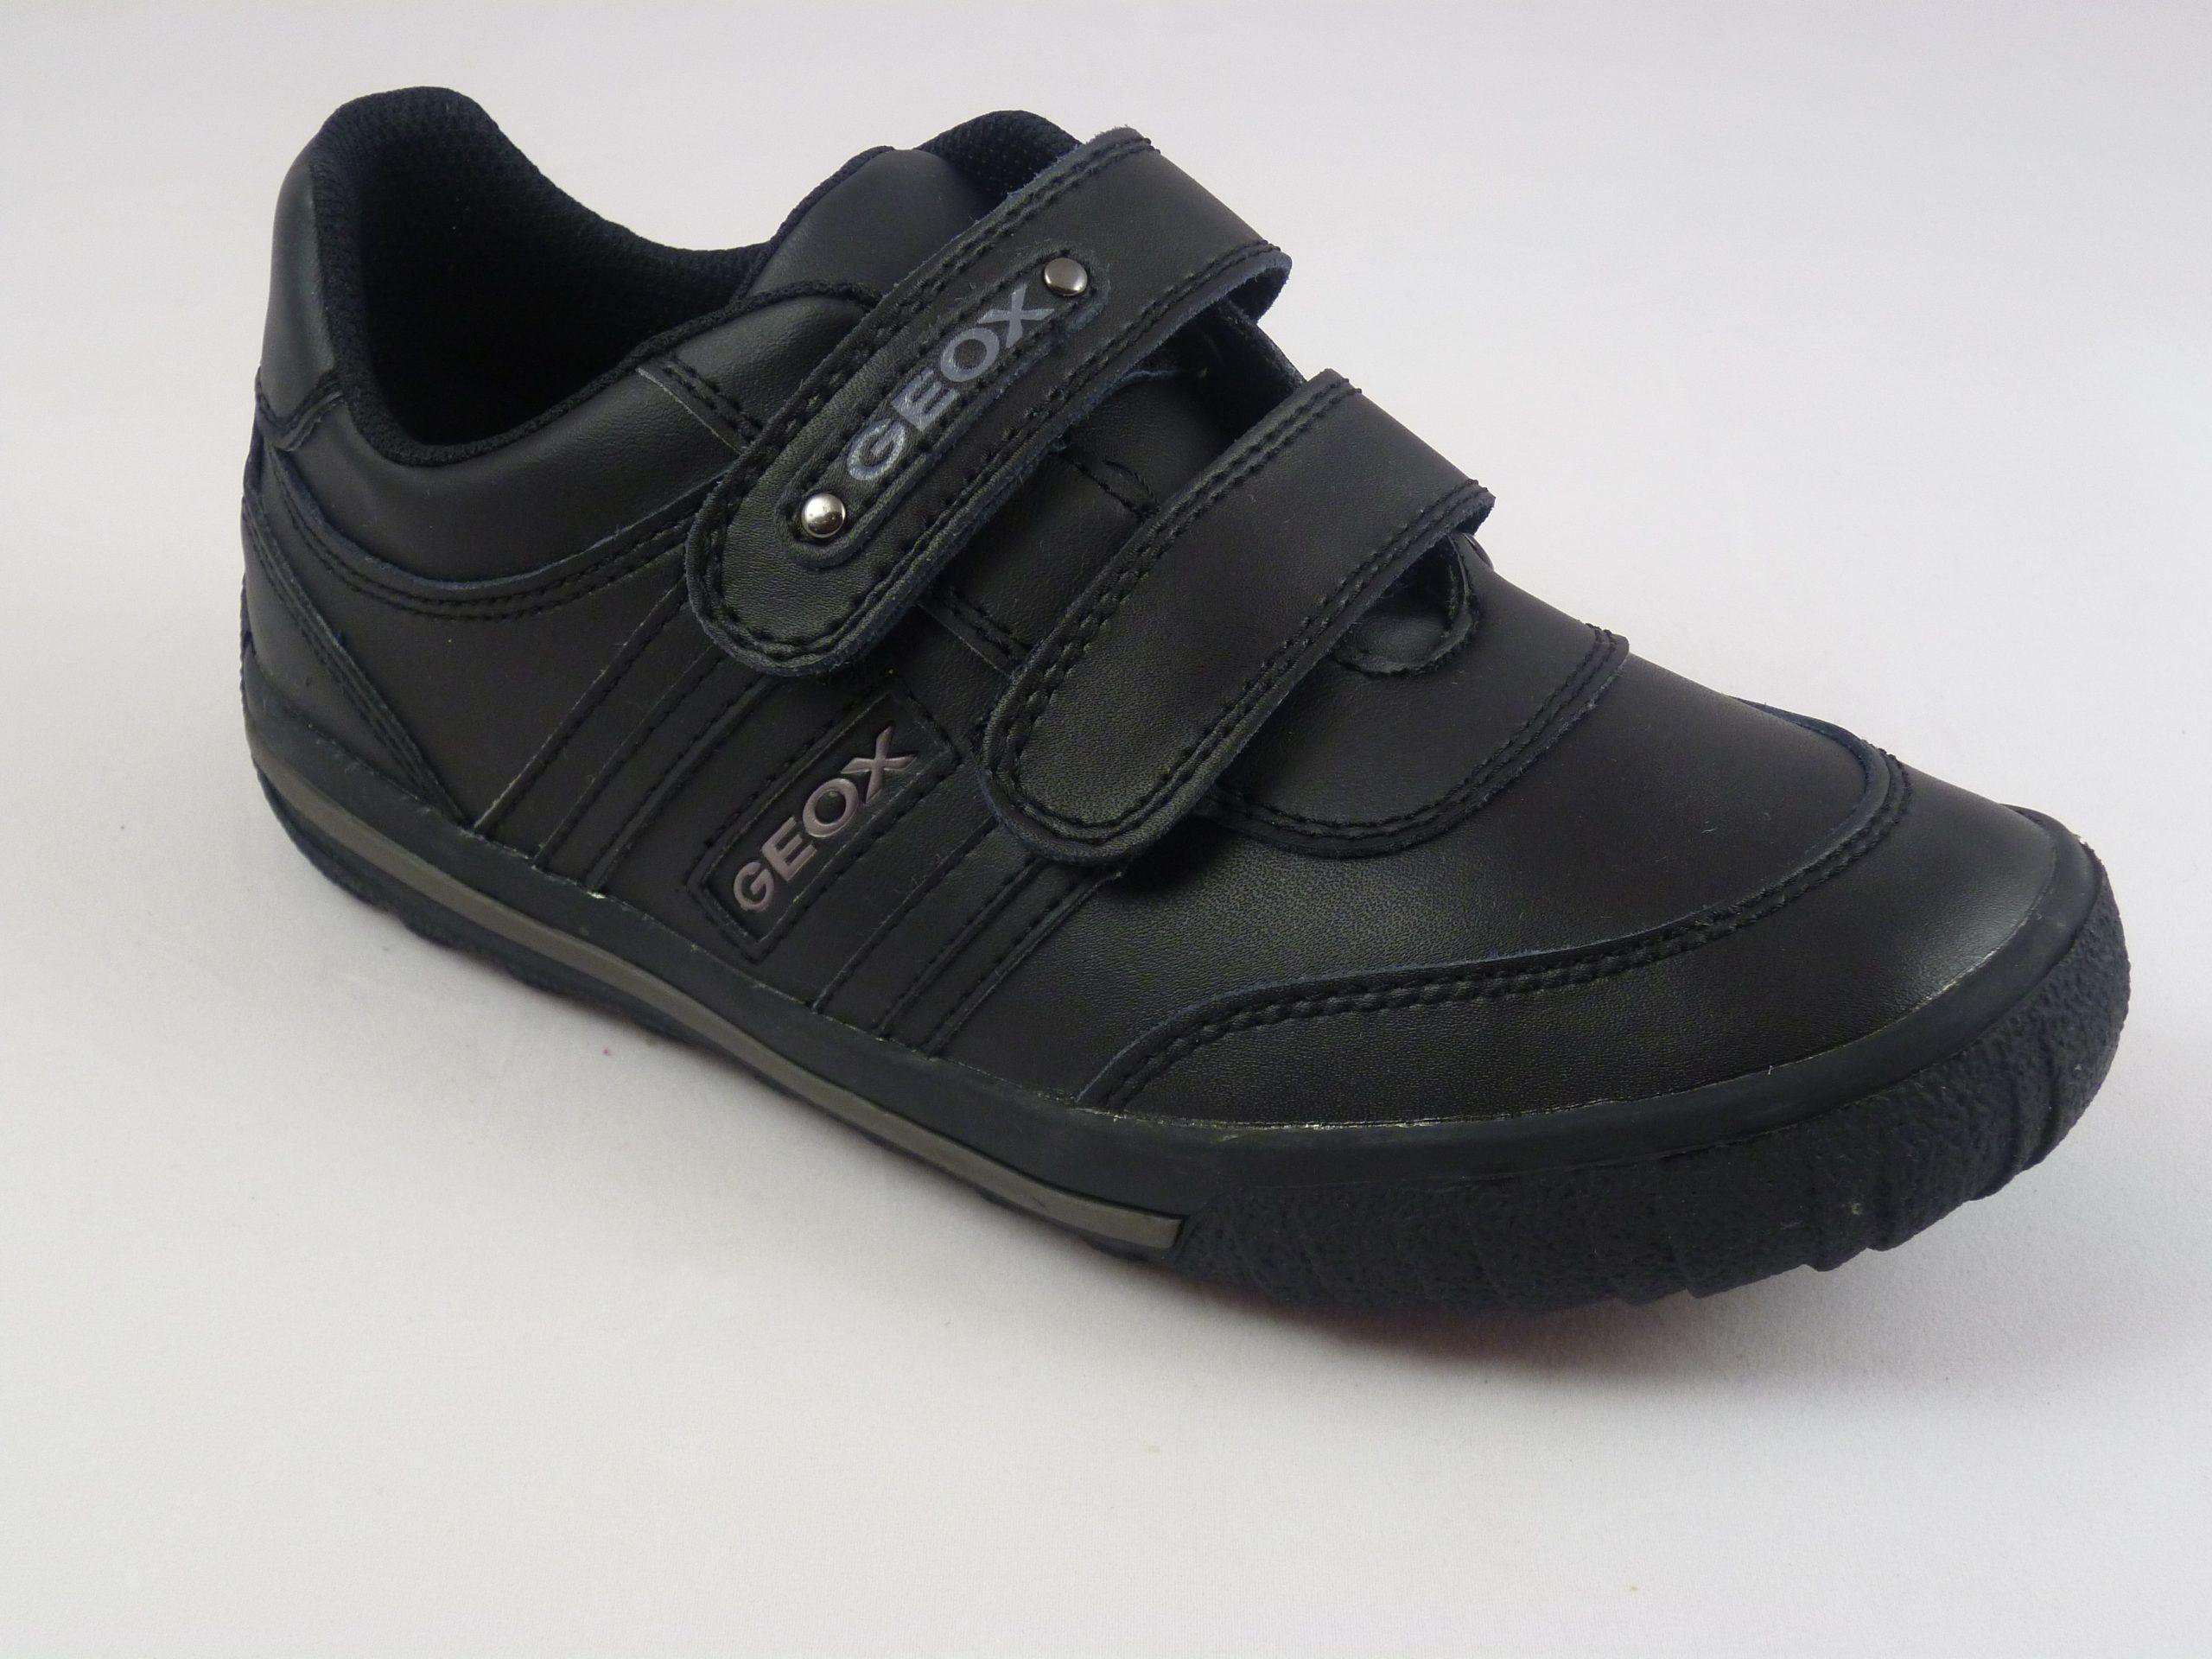 Geox Schuhe Kinder